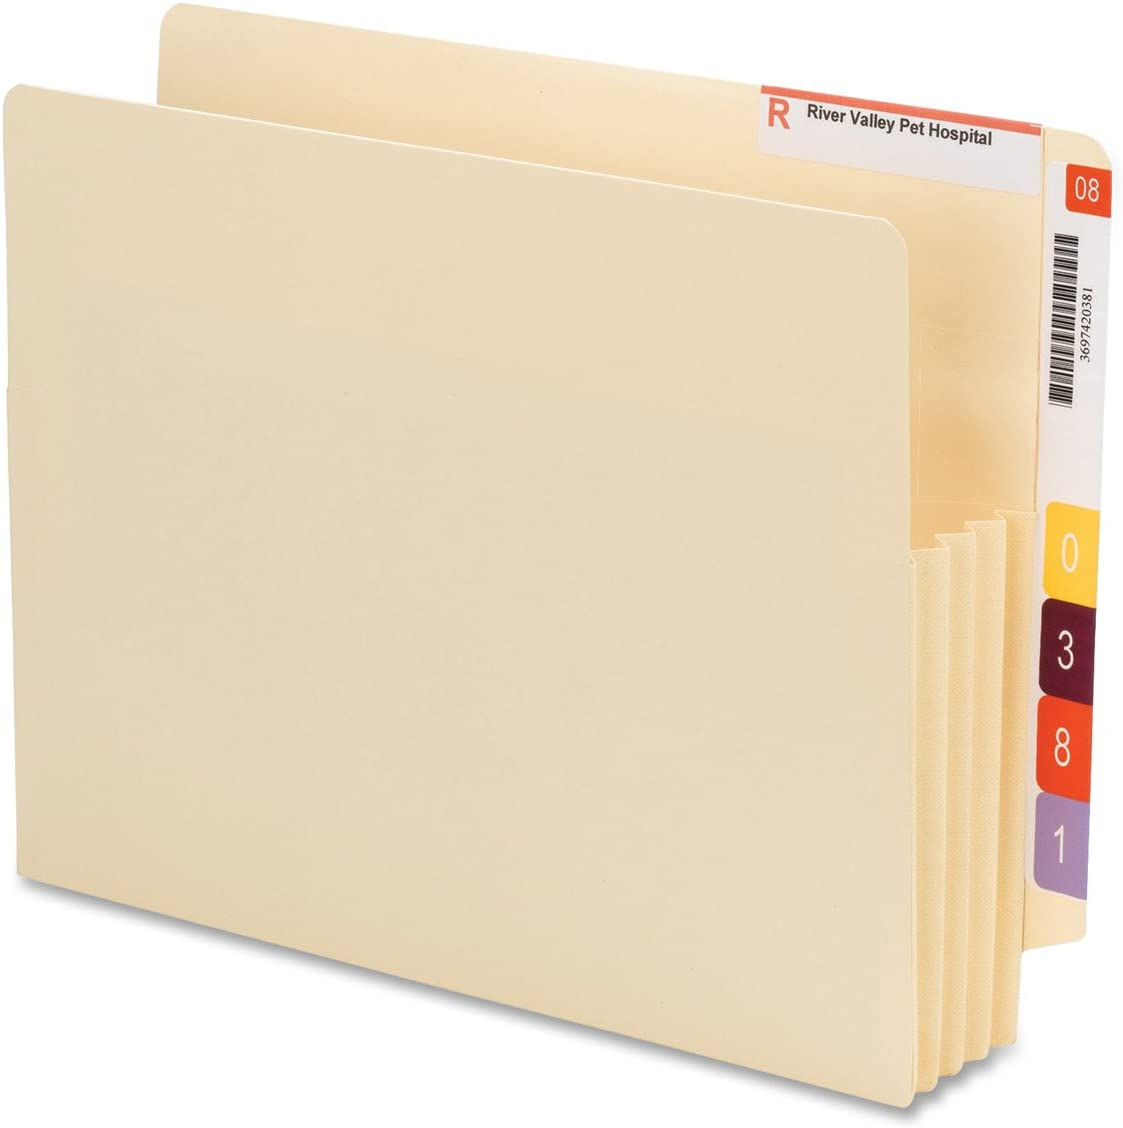 Smead End Tab Convertible File Score Split Reinforced OFFicial 2021 model shop Ta Pocket